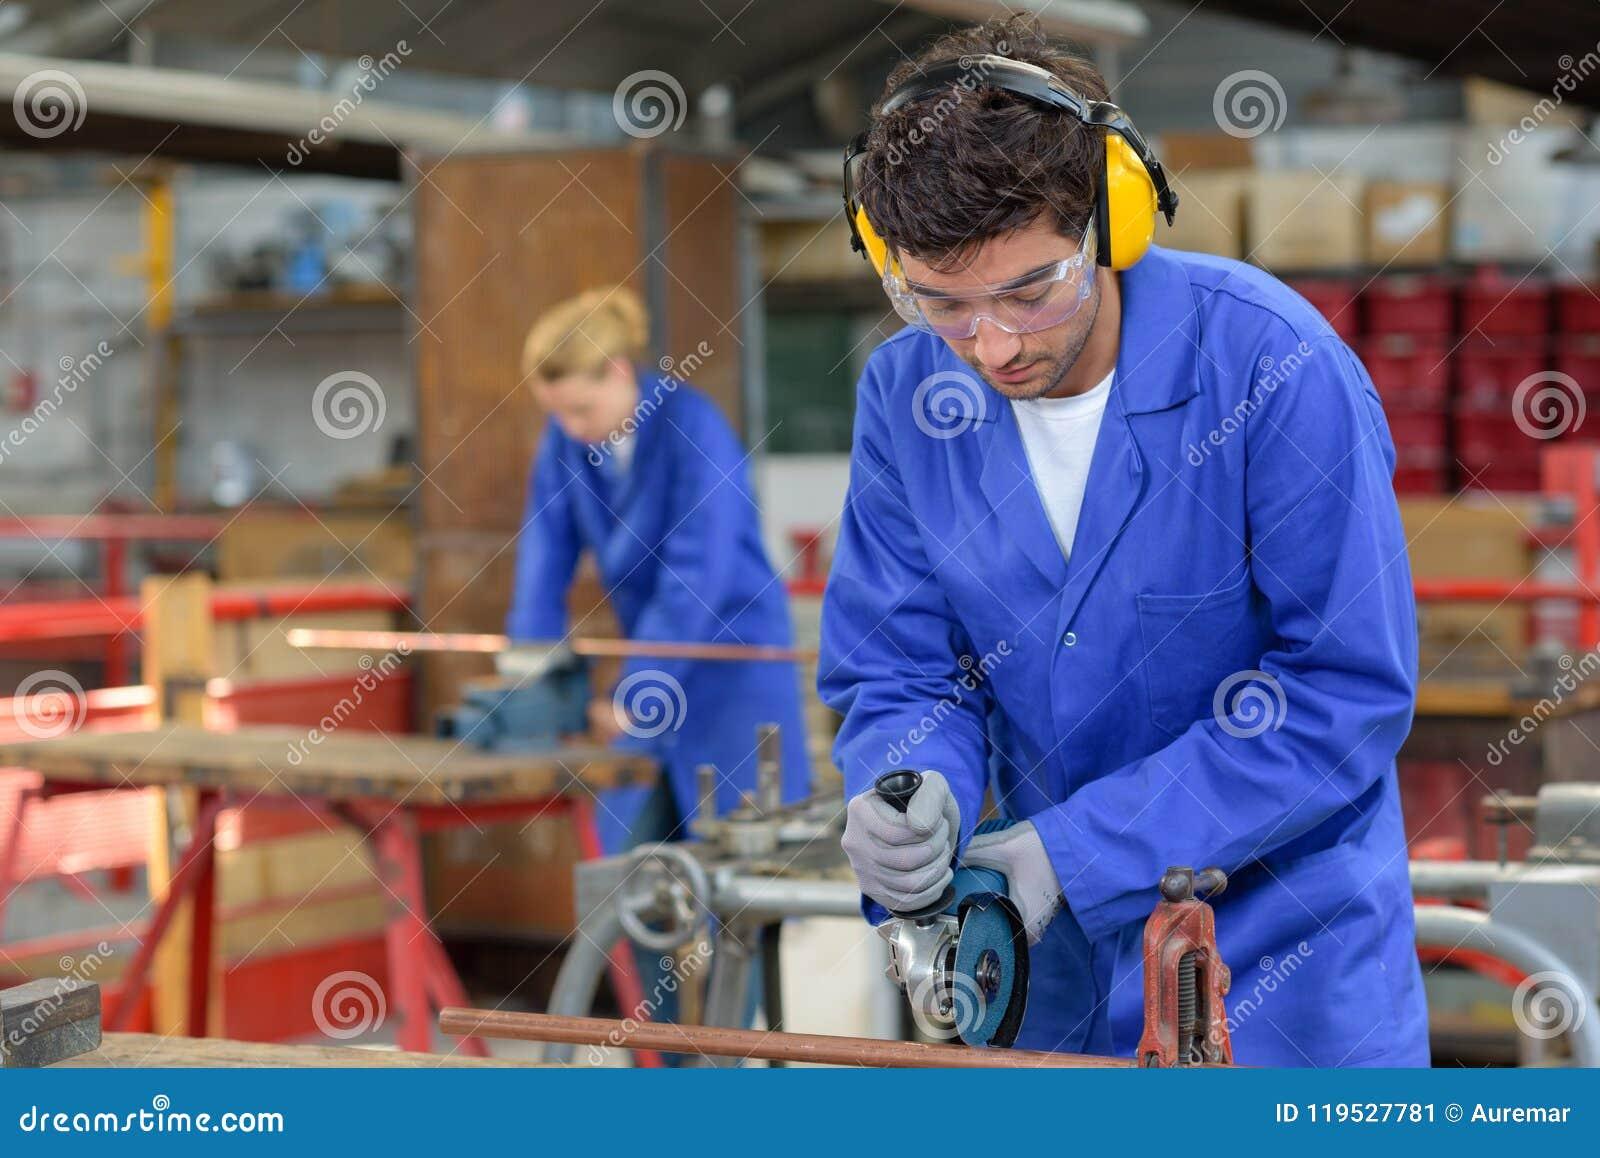 Jovens no trabalho na fábrica